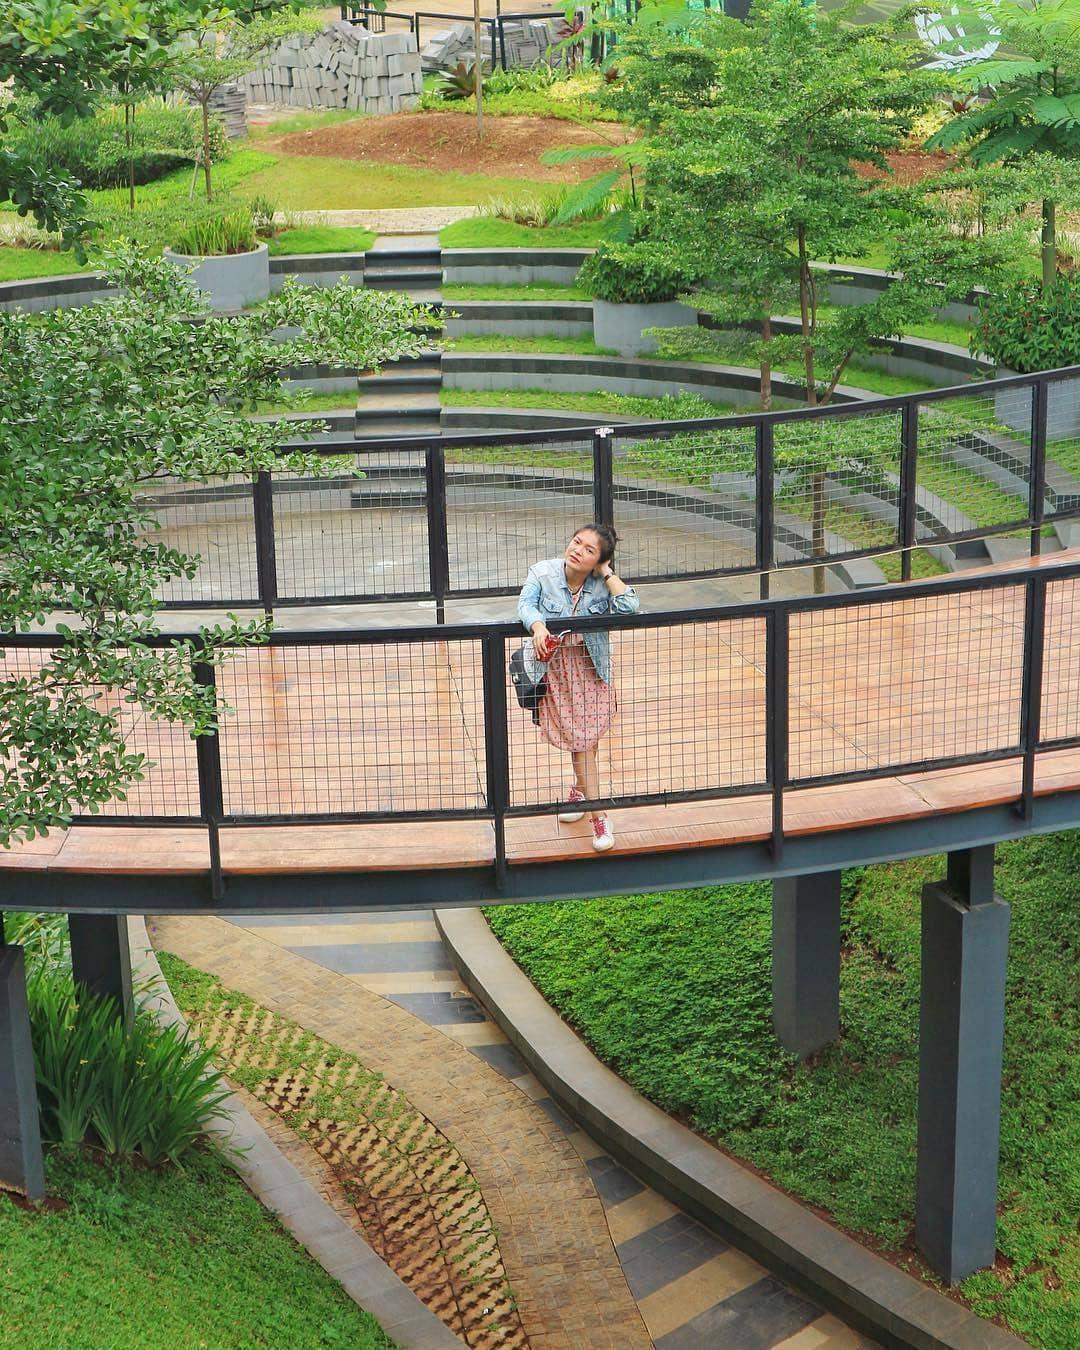 Padi Emas Sentul : sentul, Decor, (with, Pictures), Visitbogor.com, Today, Photo, @herdinavm, Sentul, Tm…, Outdoor, Structures,, Garden, Bridge,